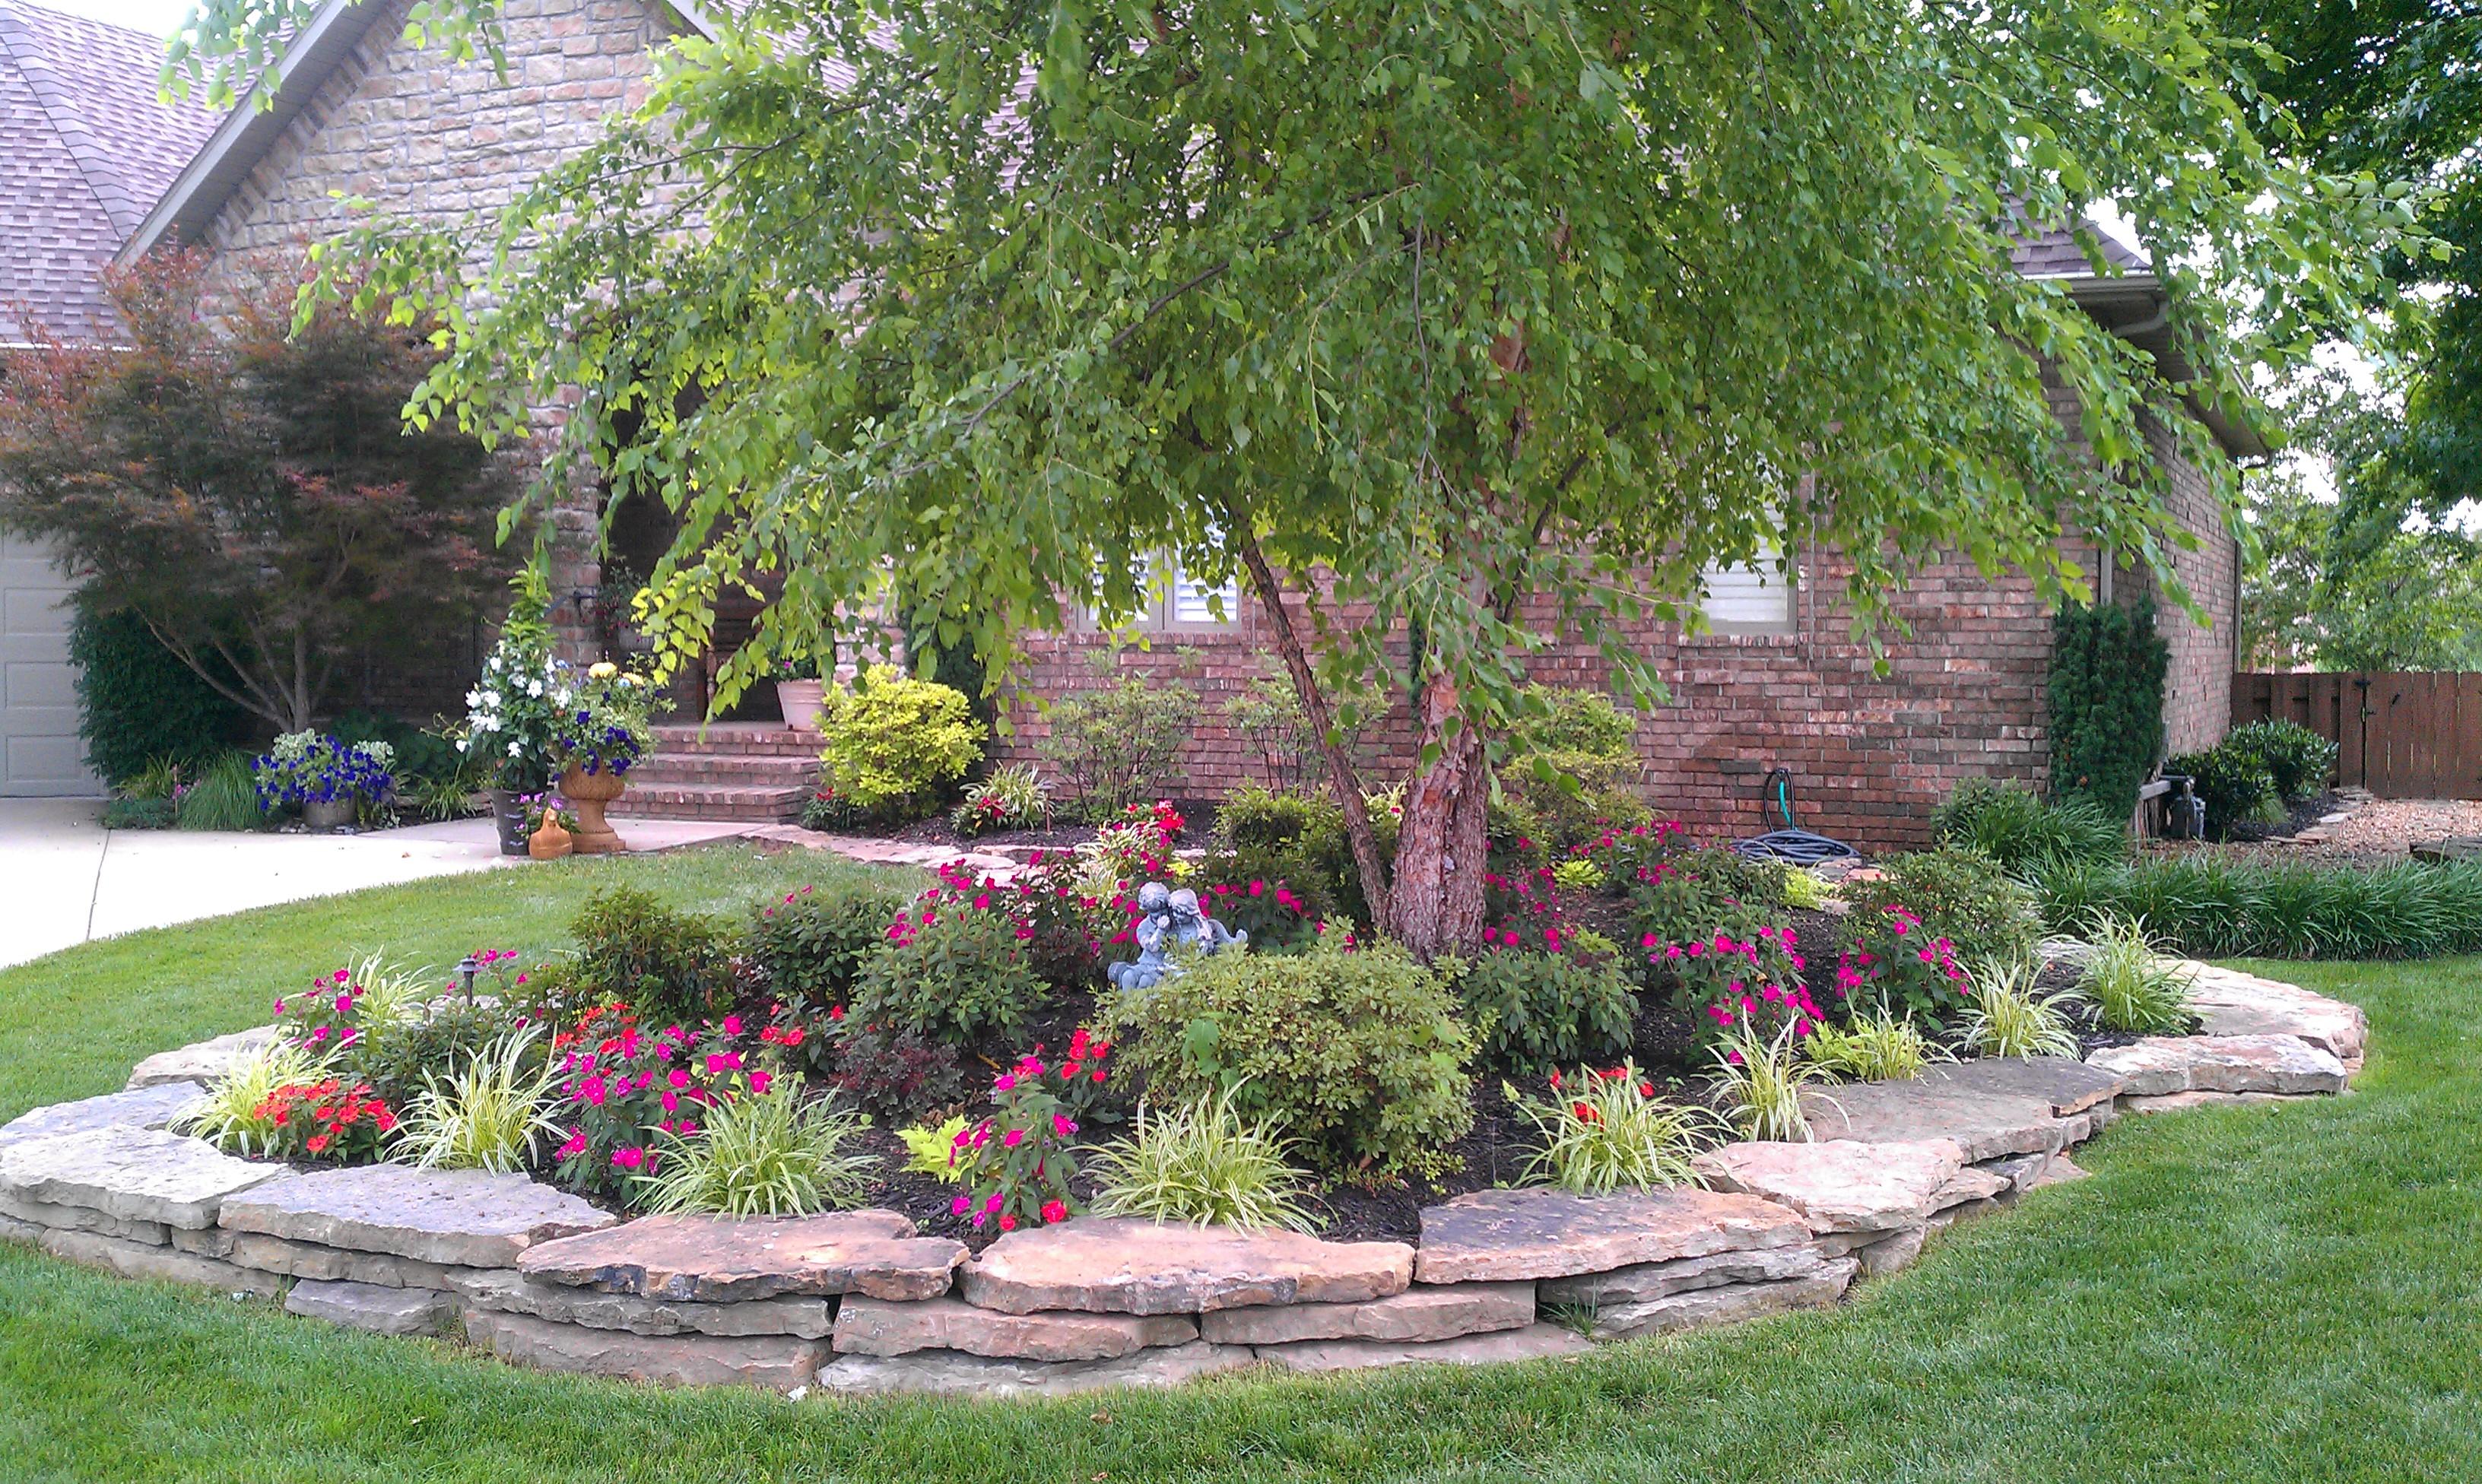 residential landscape design tucson » Design and Ideas